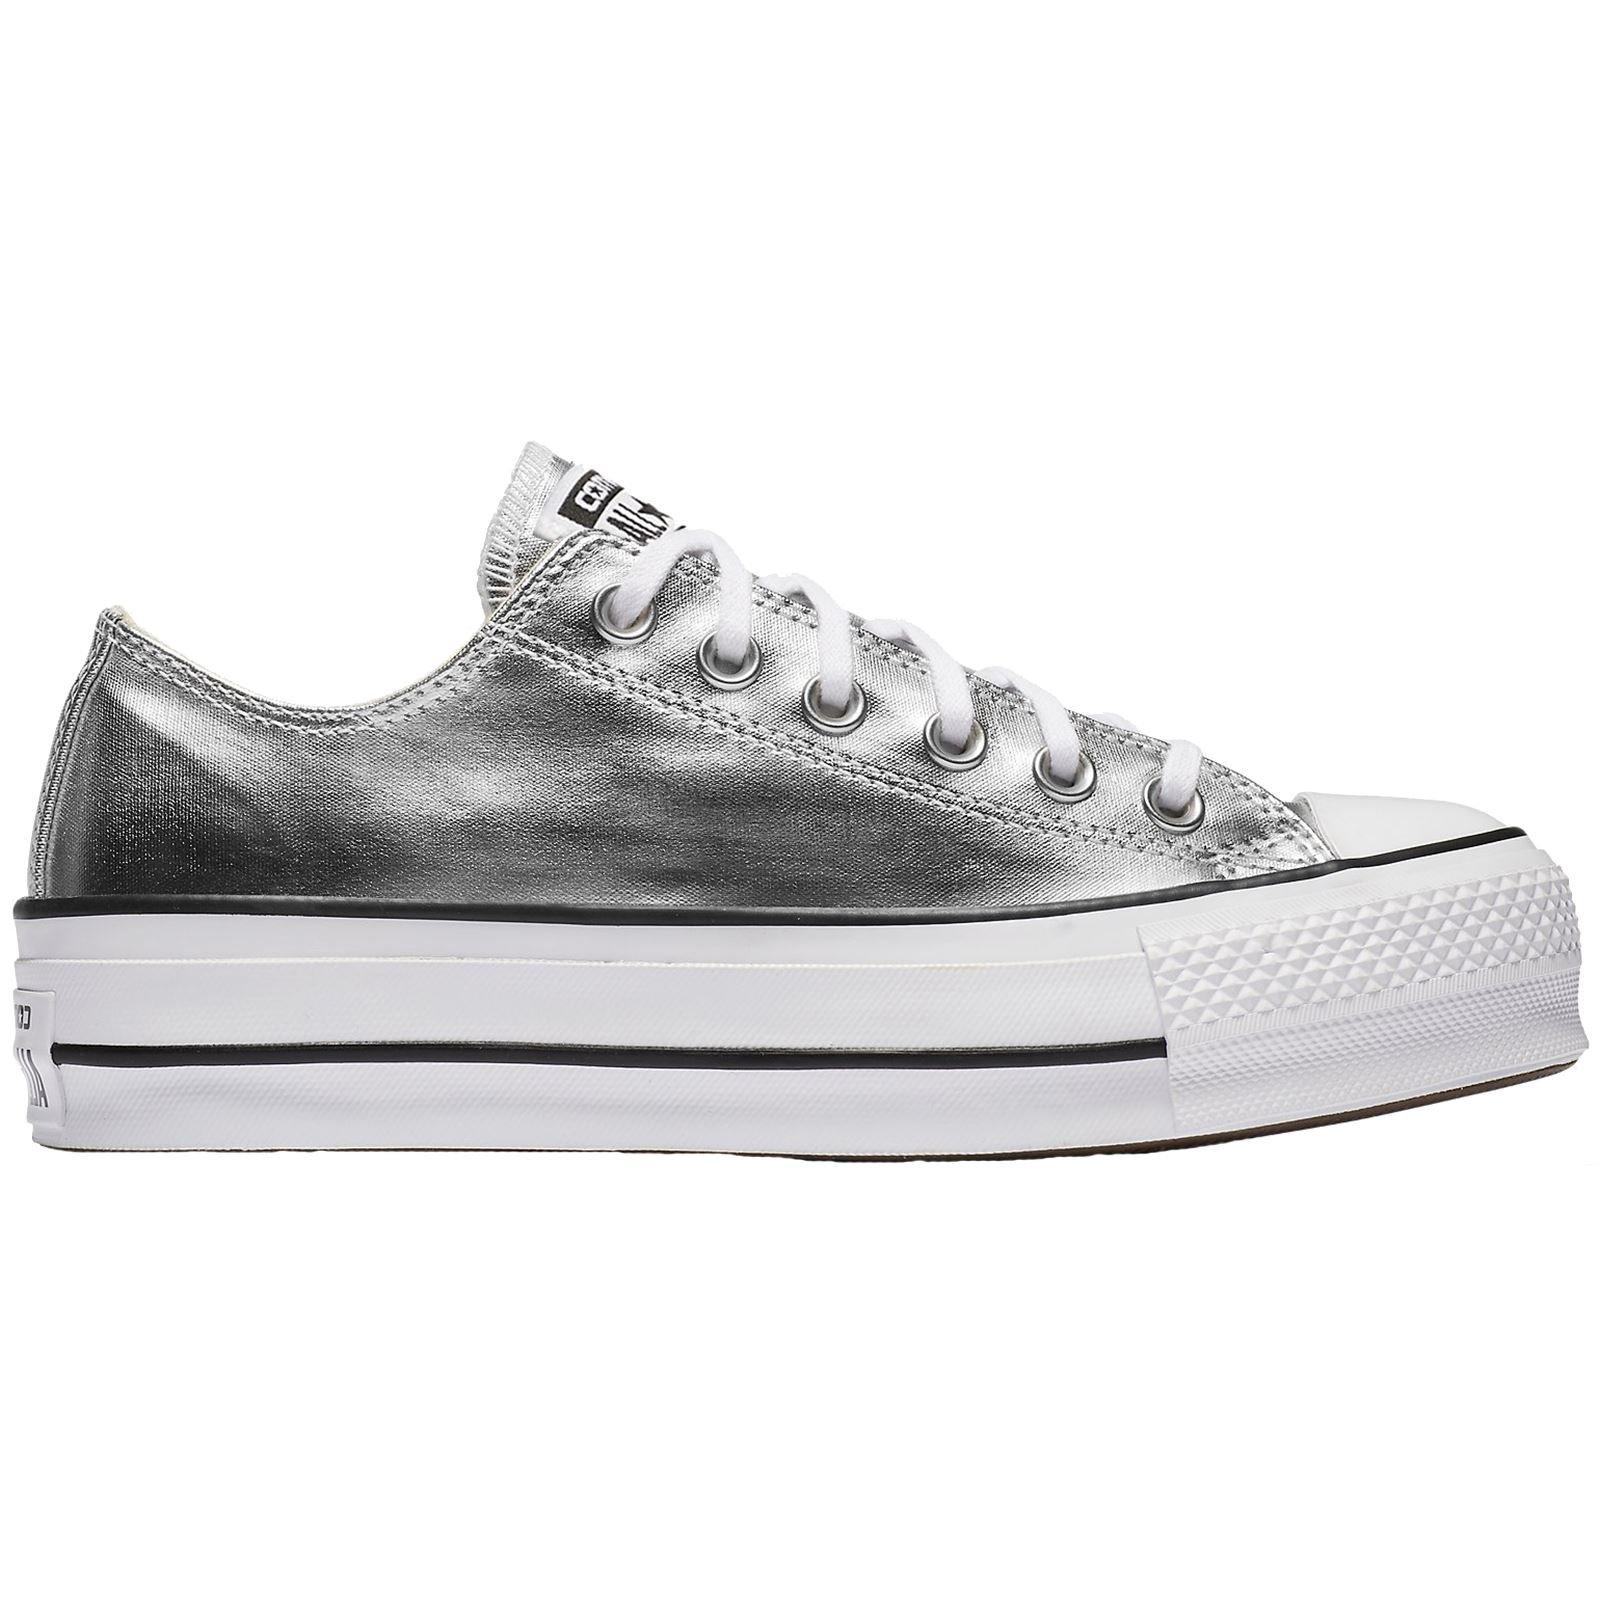 Converse Womens Chuck Taylor All Star Lift Low Top SilverBlackWhite Sneaker 9